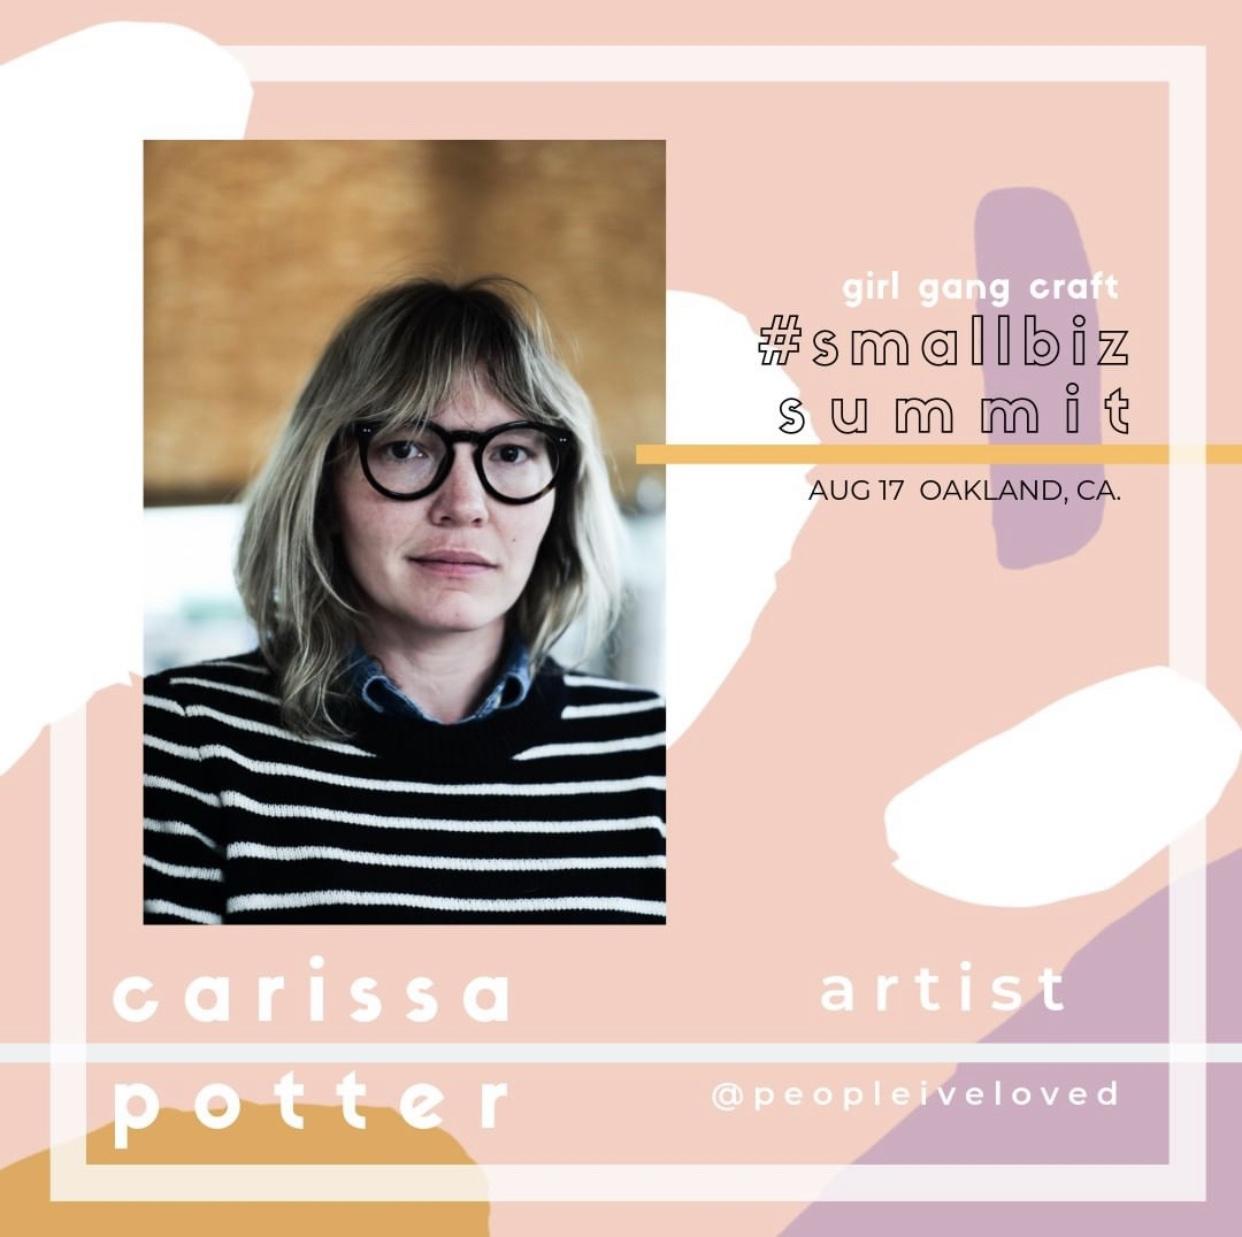 CARISSA POTTER: - KEY NOTE ADDRESSARTIST | FOUNDER OF @peopleiveloved